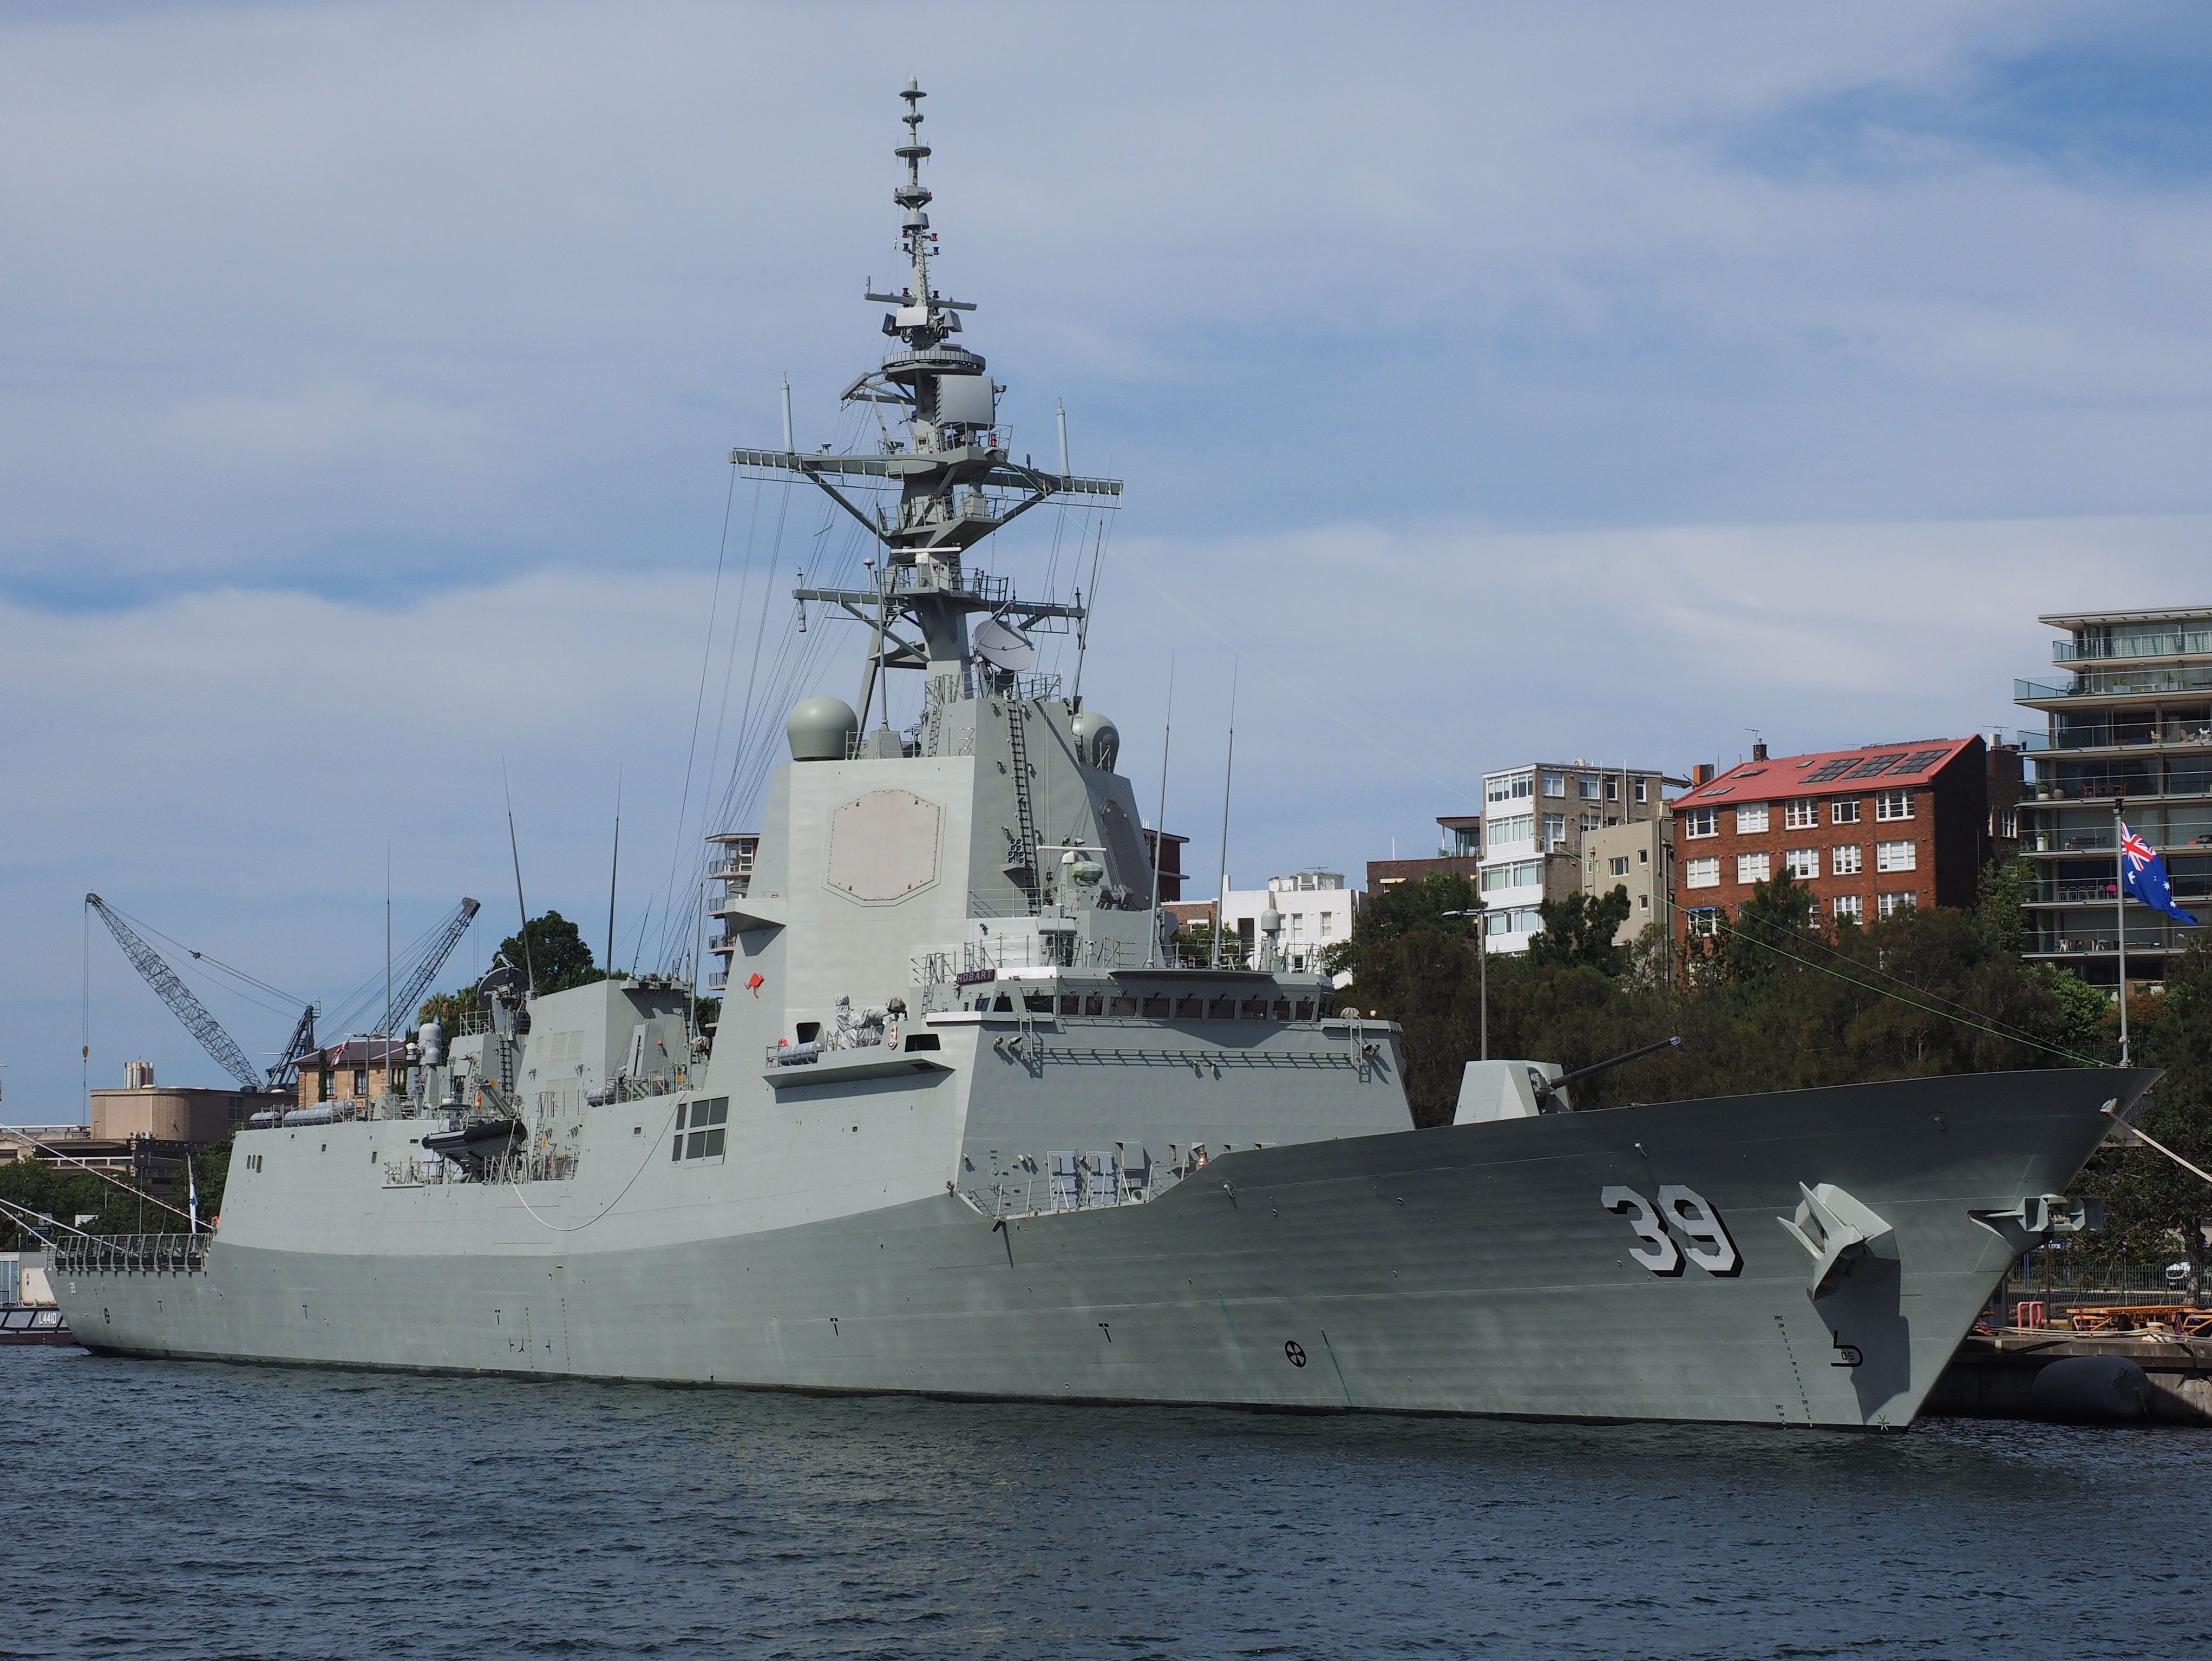 Hobart-class destroyer - Wikipedia